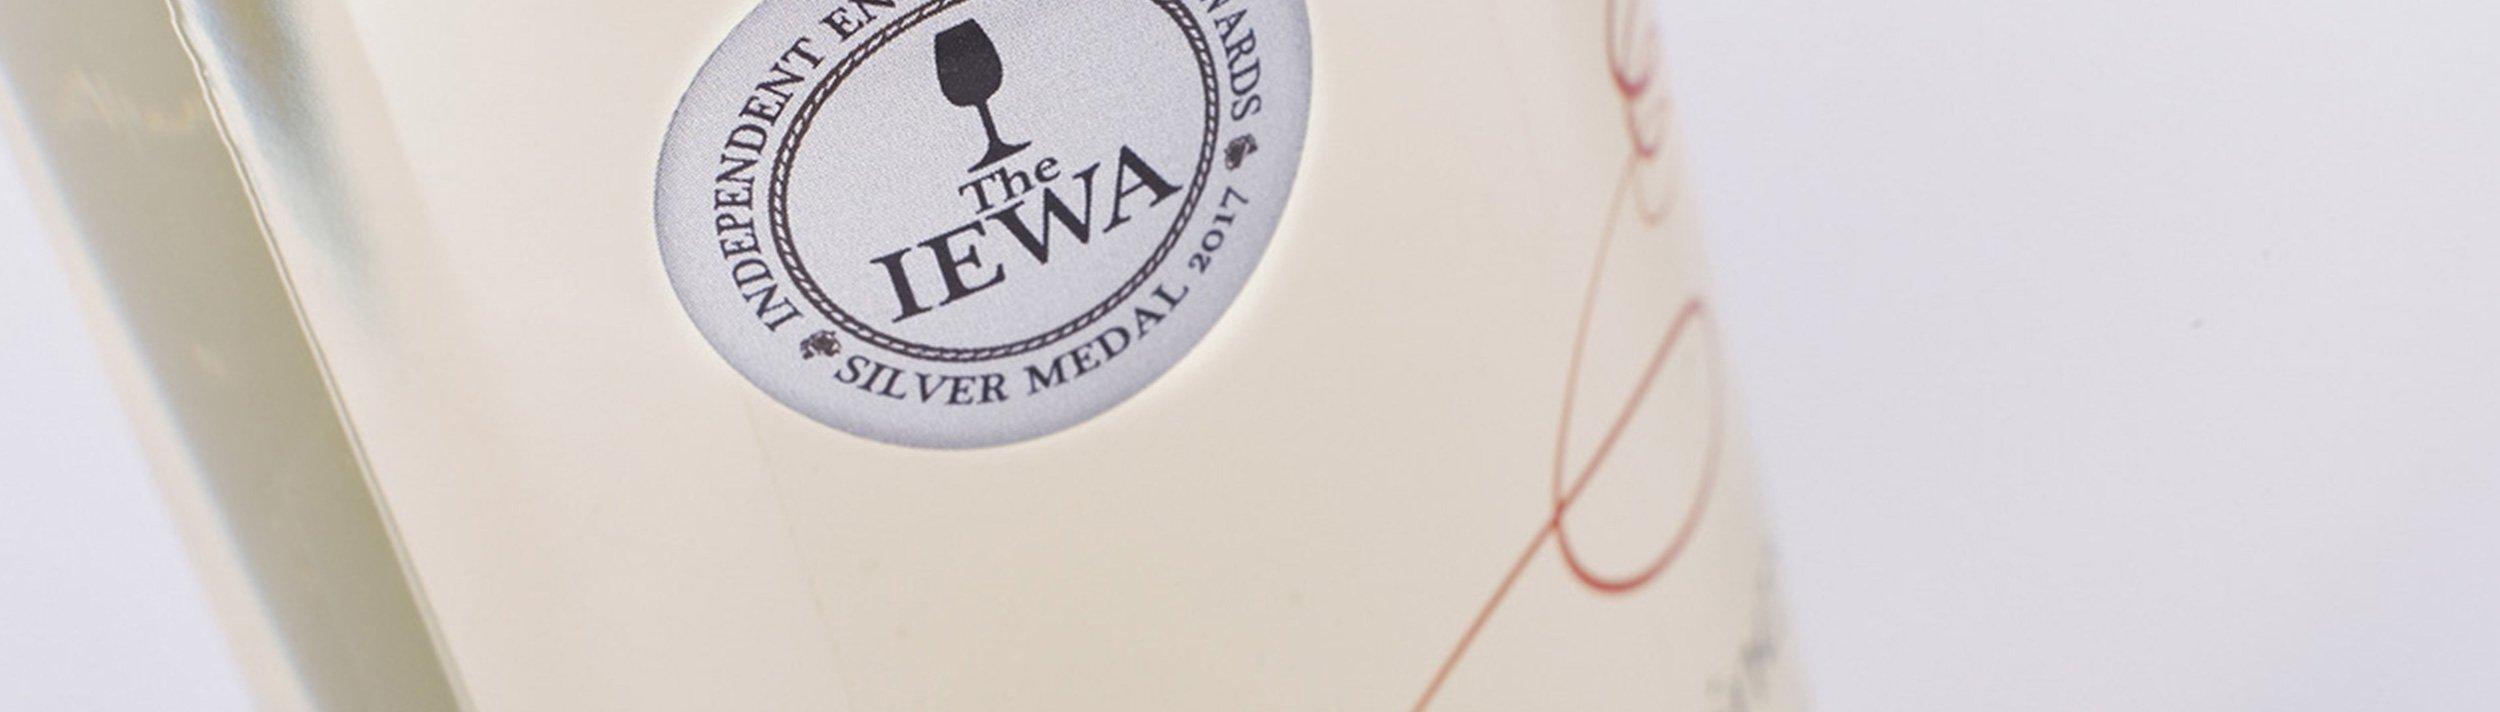 IEWA 2017 awards wine winner